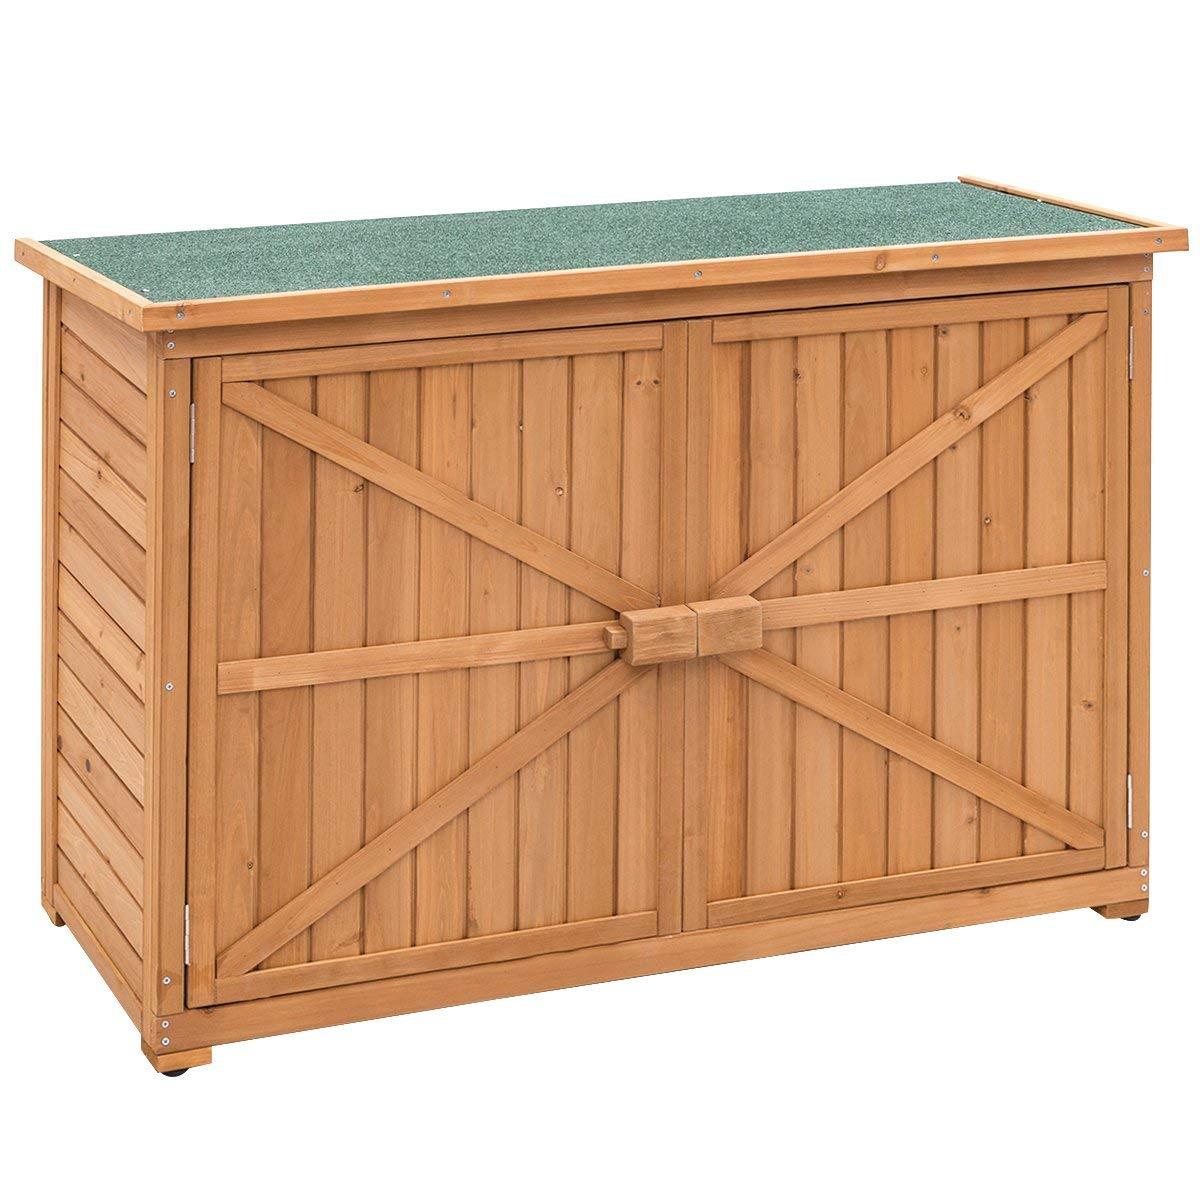 Goplus Wooden Garden Shed Outdoor Storage Cabinet Fir Wood Double Door Yard Locker (Natural) by Goplus